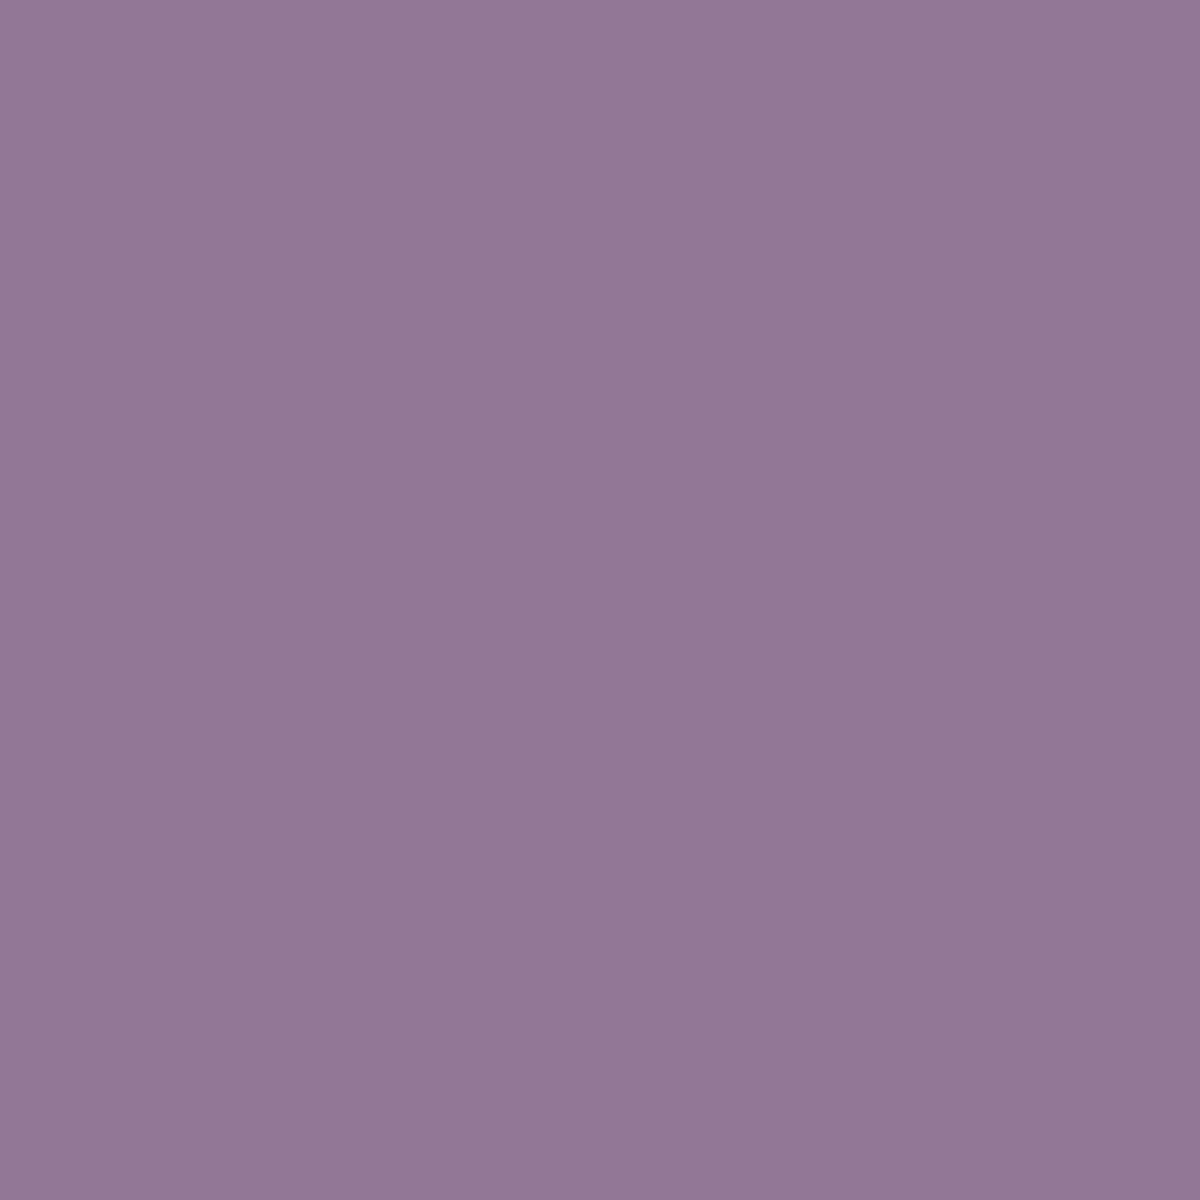 Riley Blake, Confetti Solid Purple Mountain Majesty